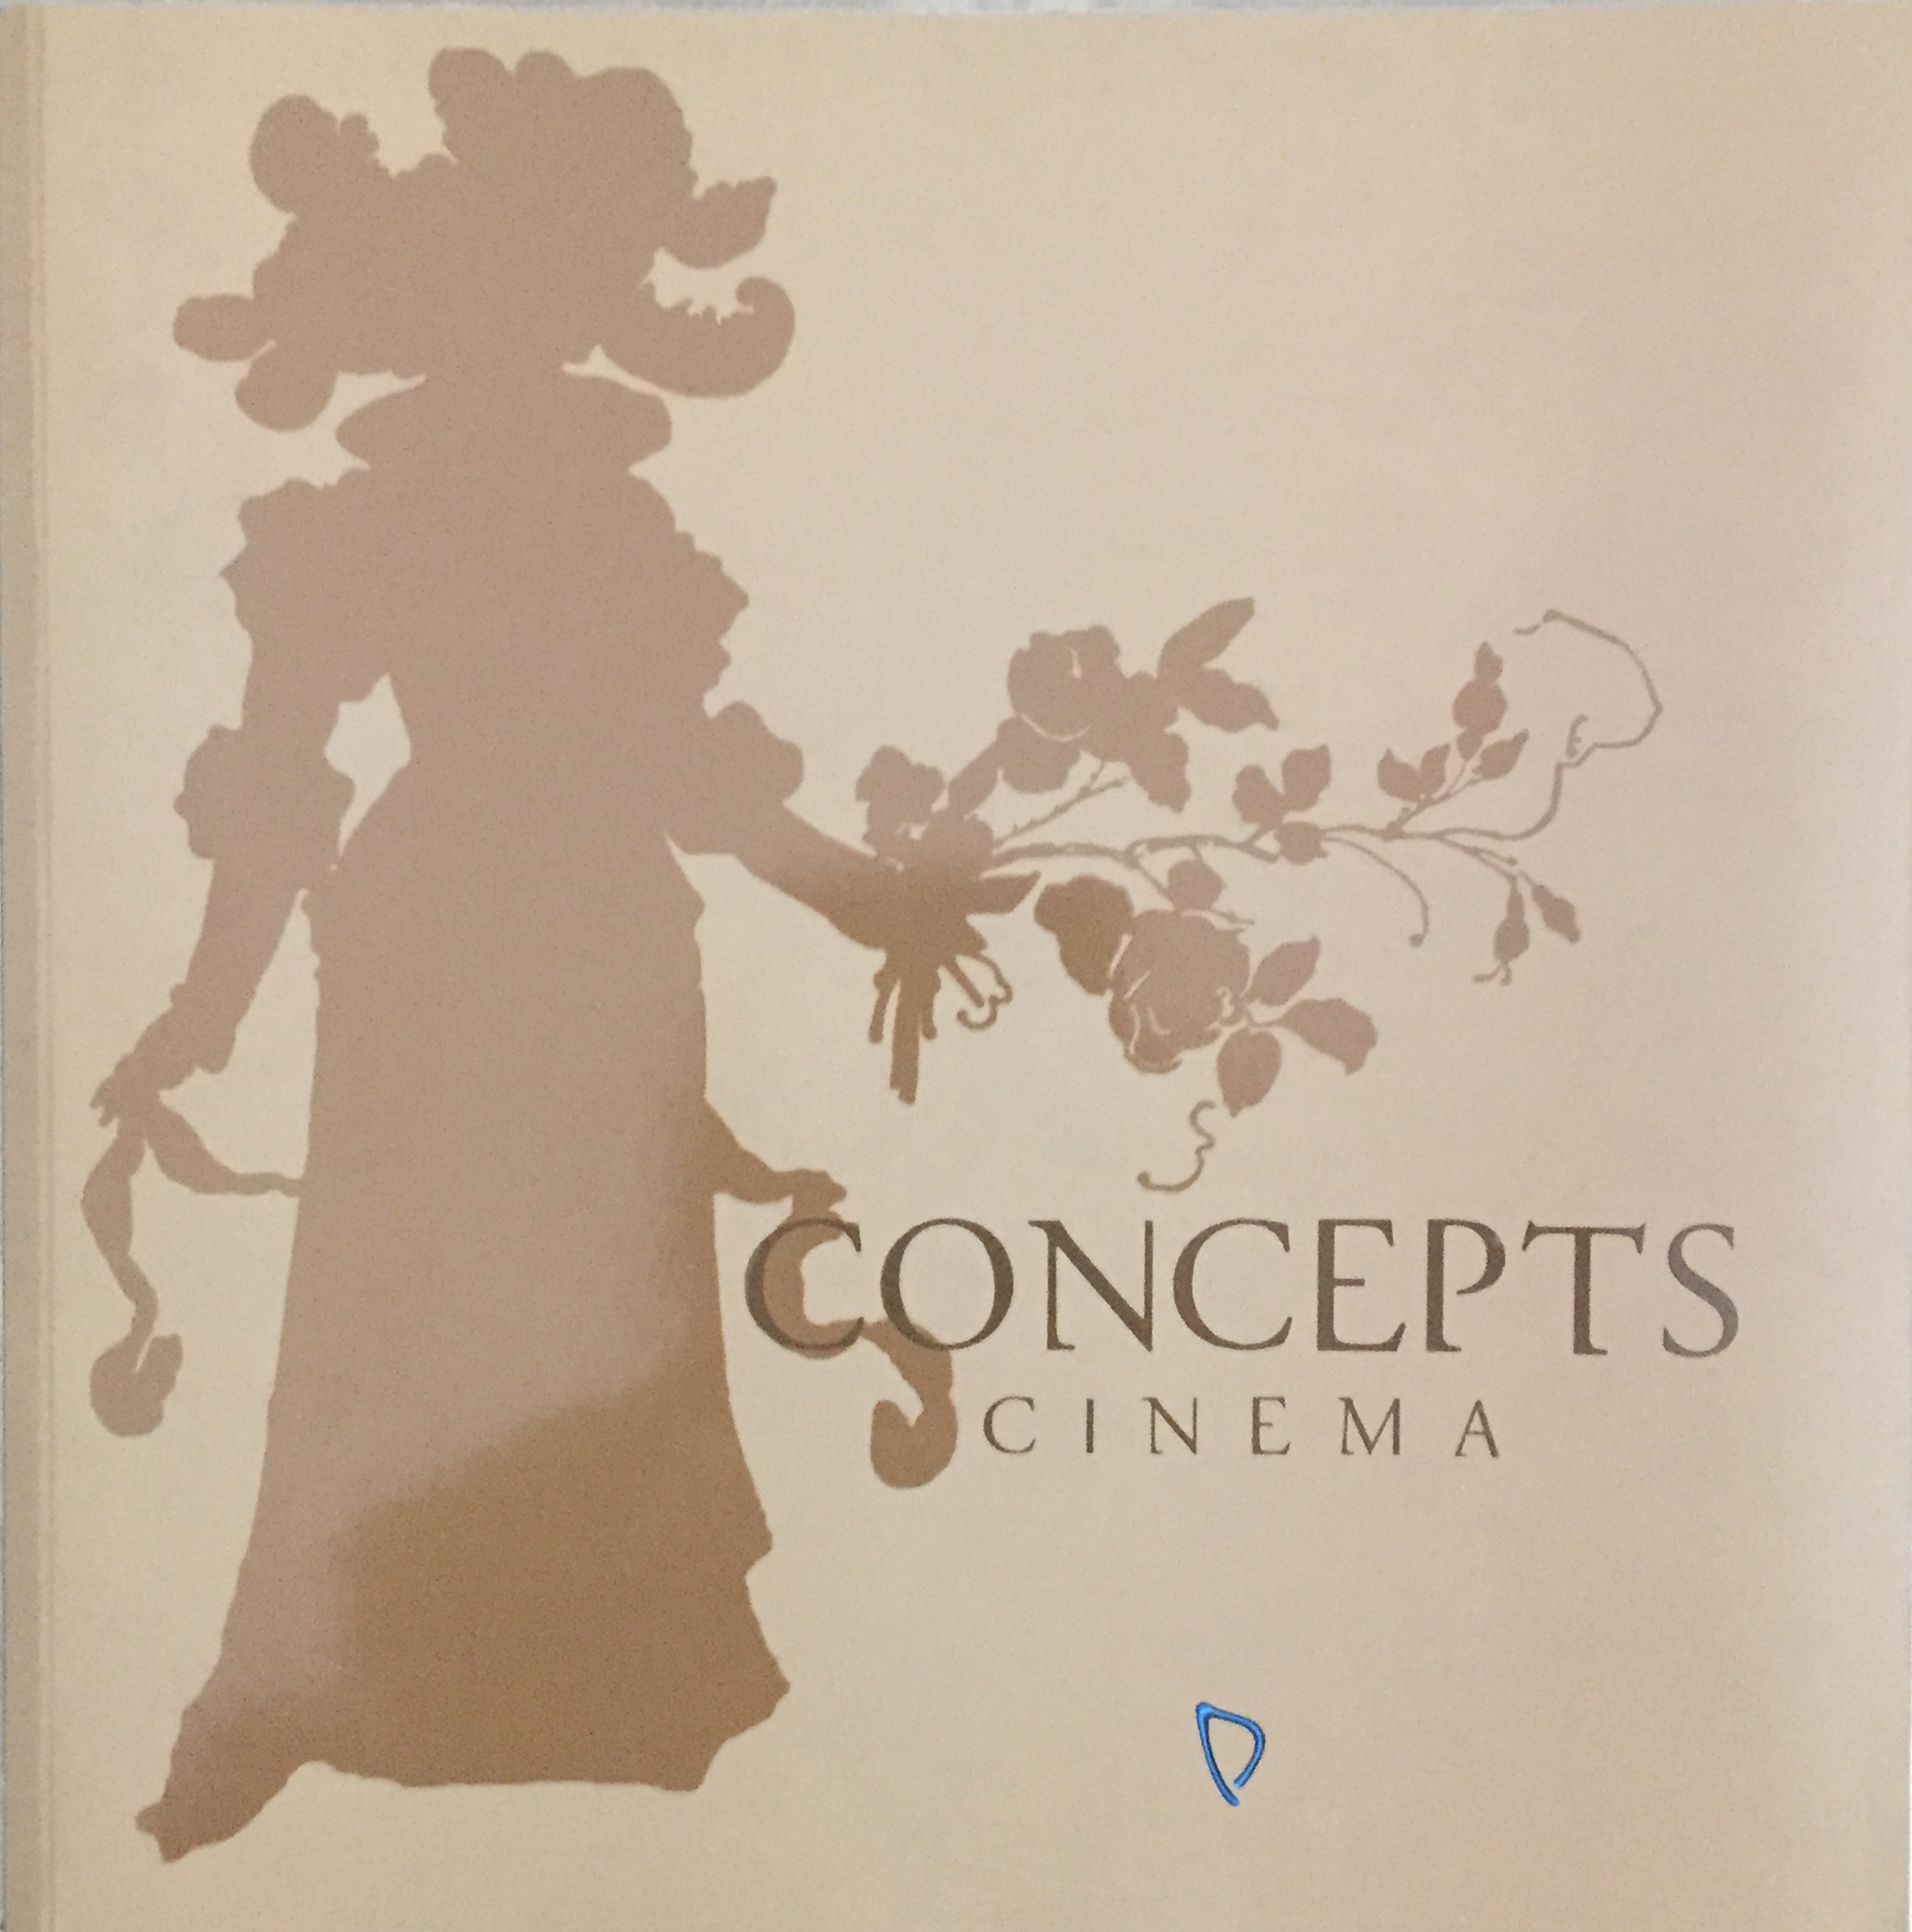 CONCEPTS CINEMA. Racconti